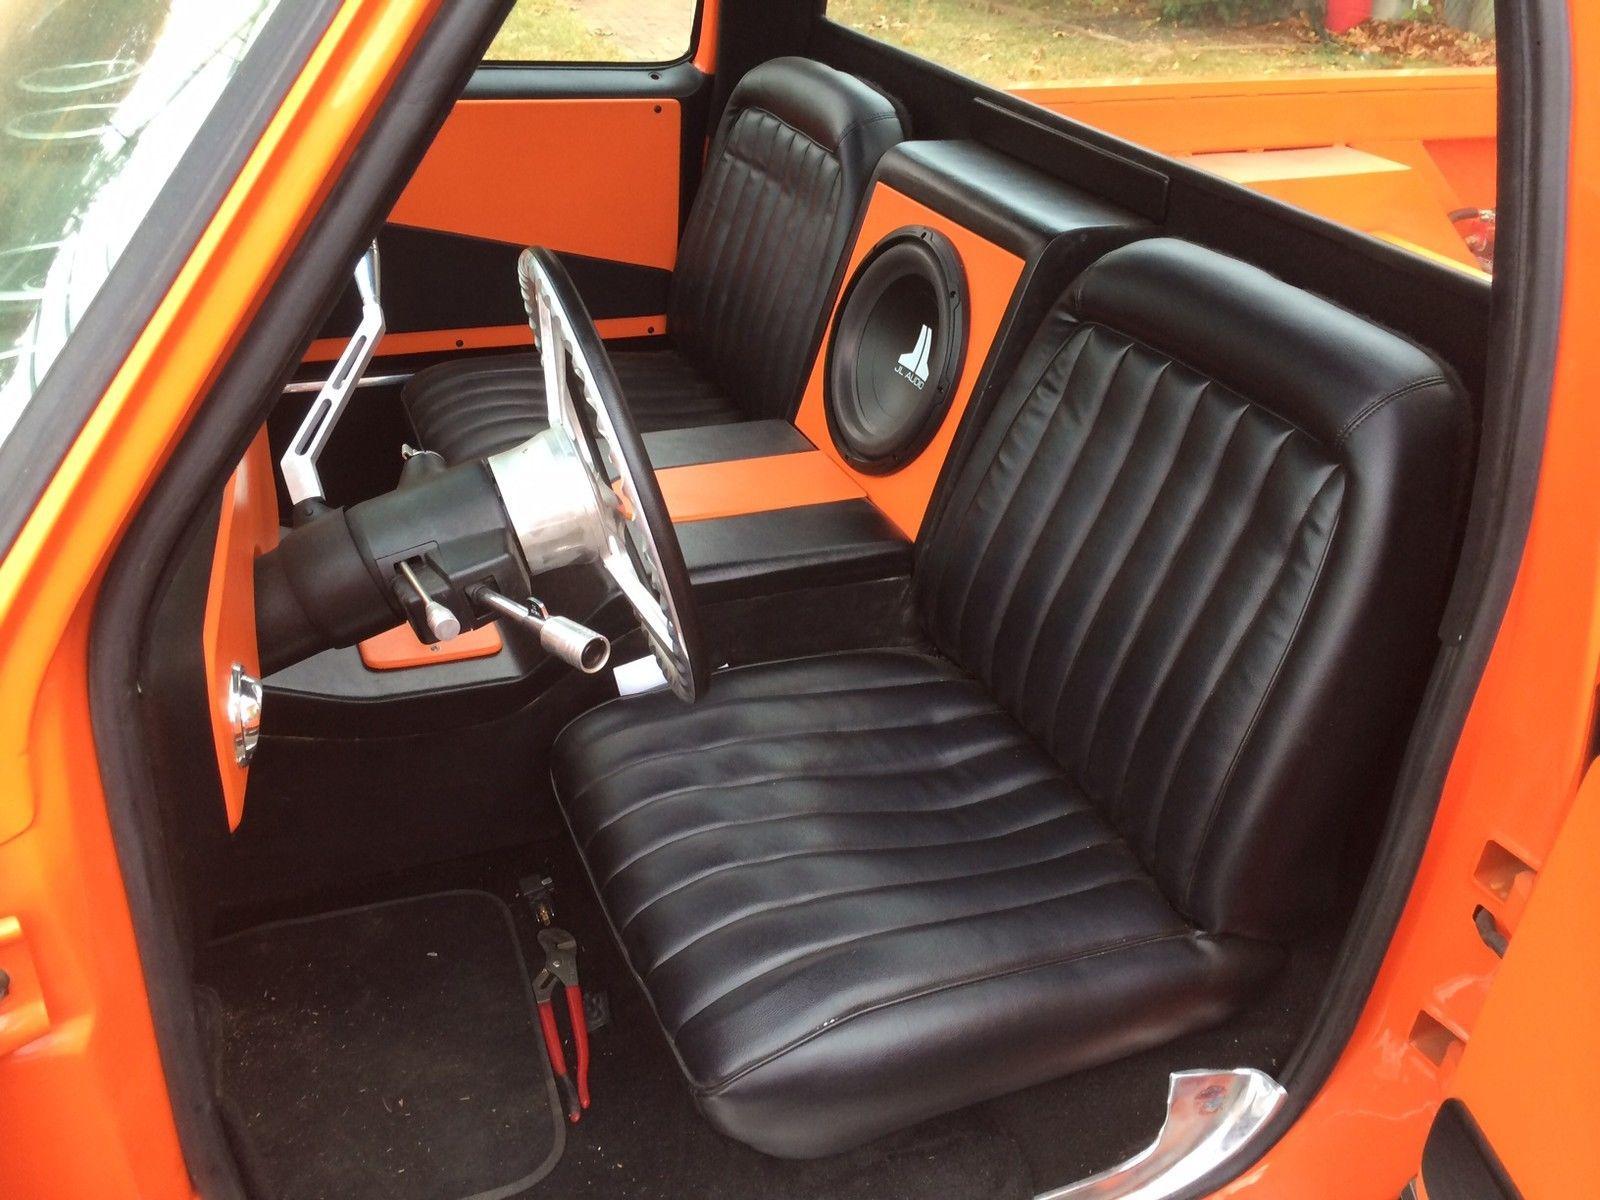 1985 Chevy C10 Custom Air Bagged Pro Street Custom Car Interior Chevy C10 Truck Interior